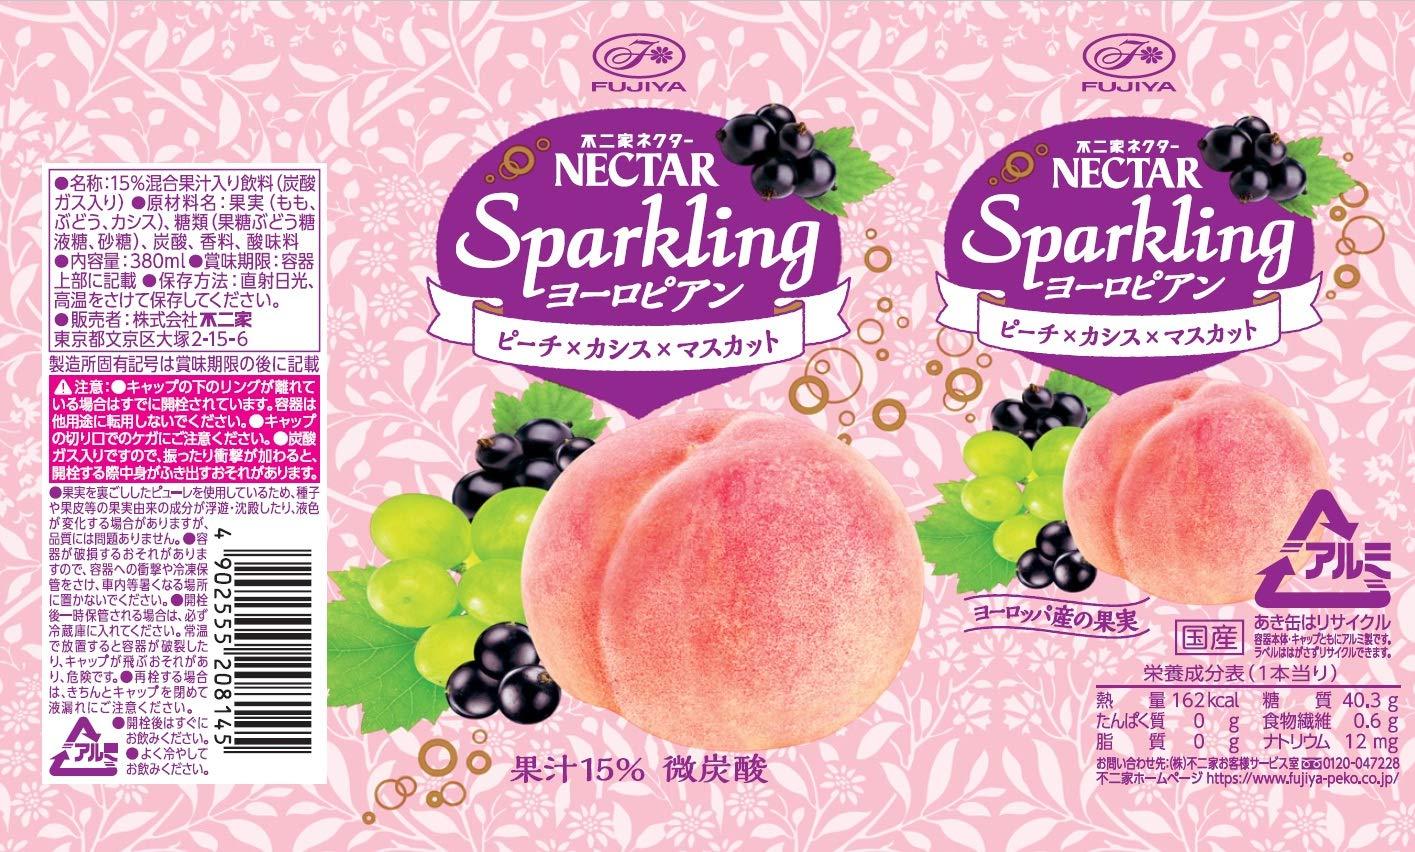 【FUJIYA不二家】NECTAR Sparkling 水蜜桃葡萄微碳酸飲料 380ml 果汁含量15% 日本進口飲料 3.18-4 / 7店休 暫停出貨 2